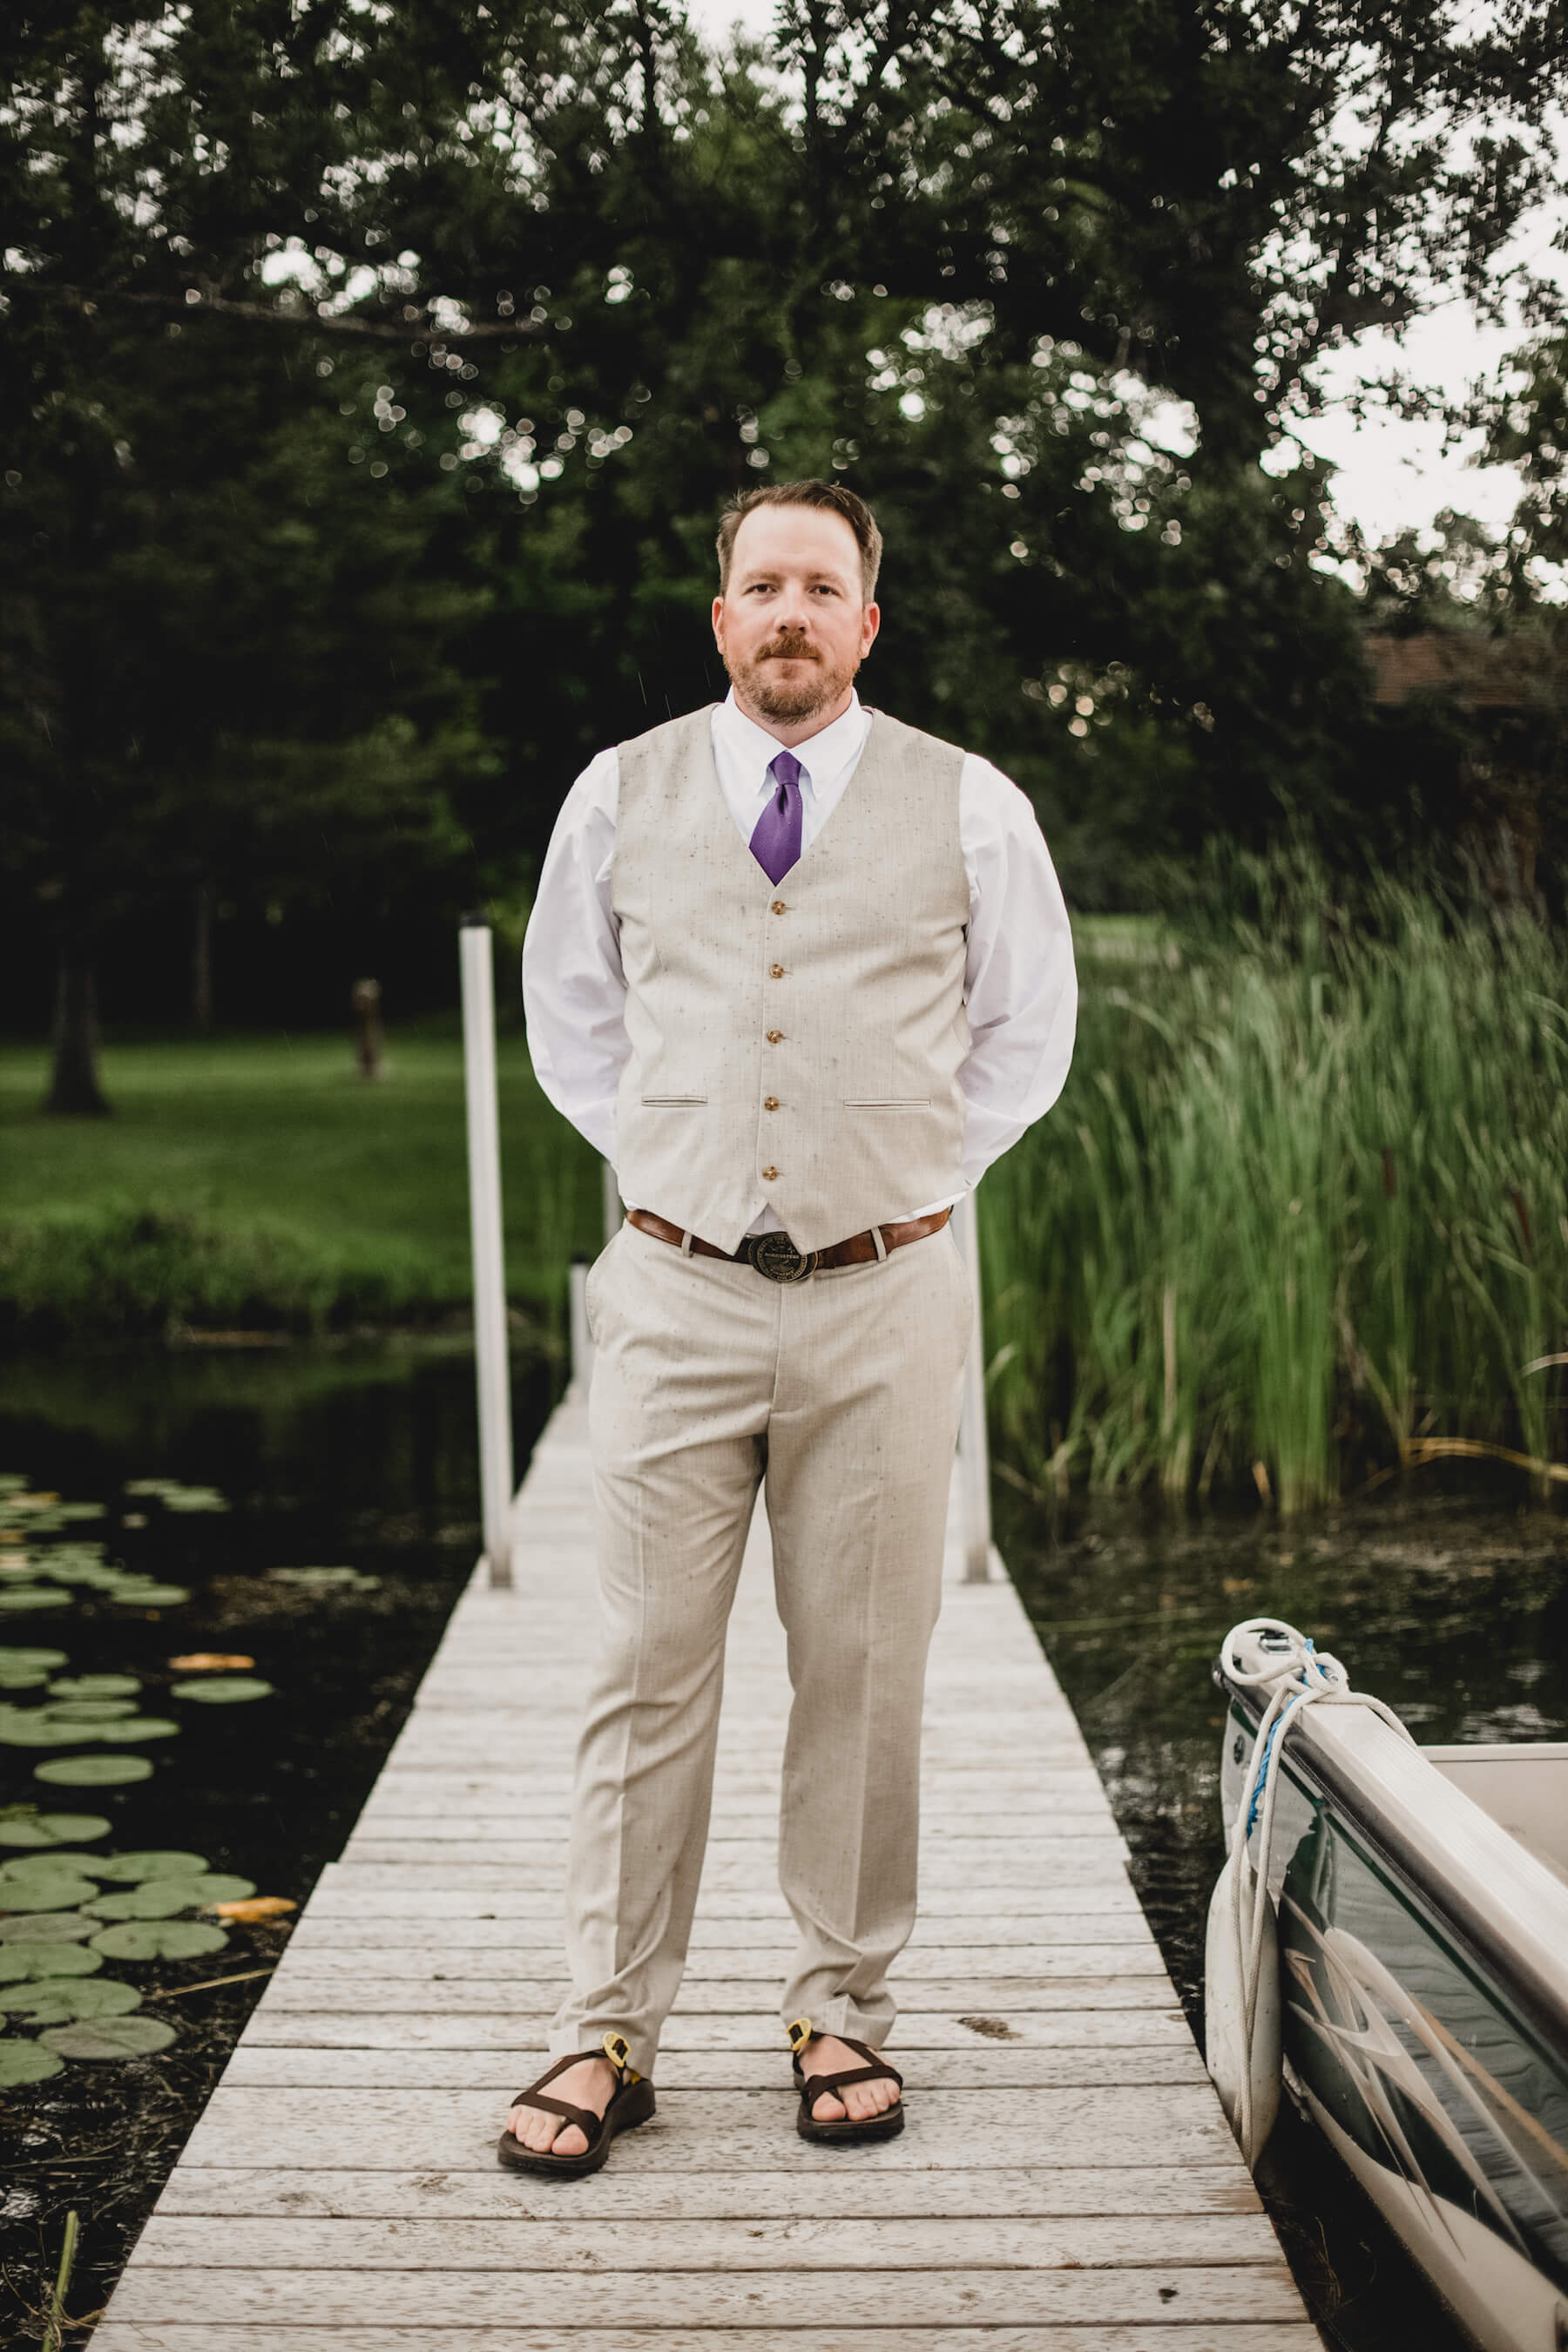 engle-olson-maddy-pat-mn-wedding-photography-5.jpg